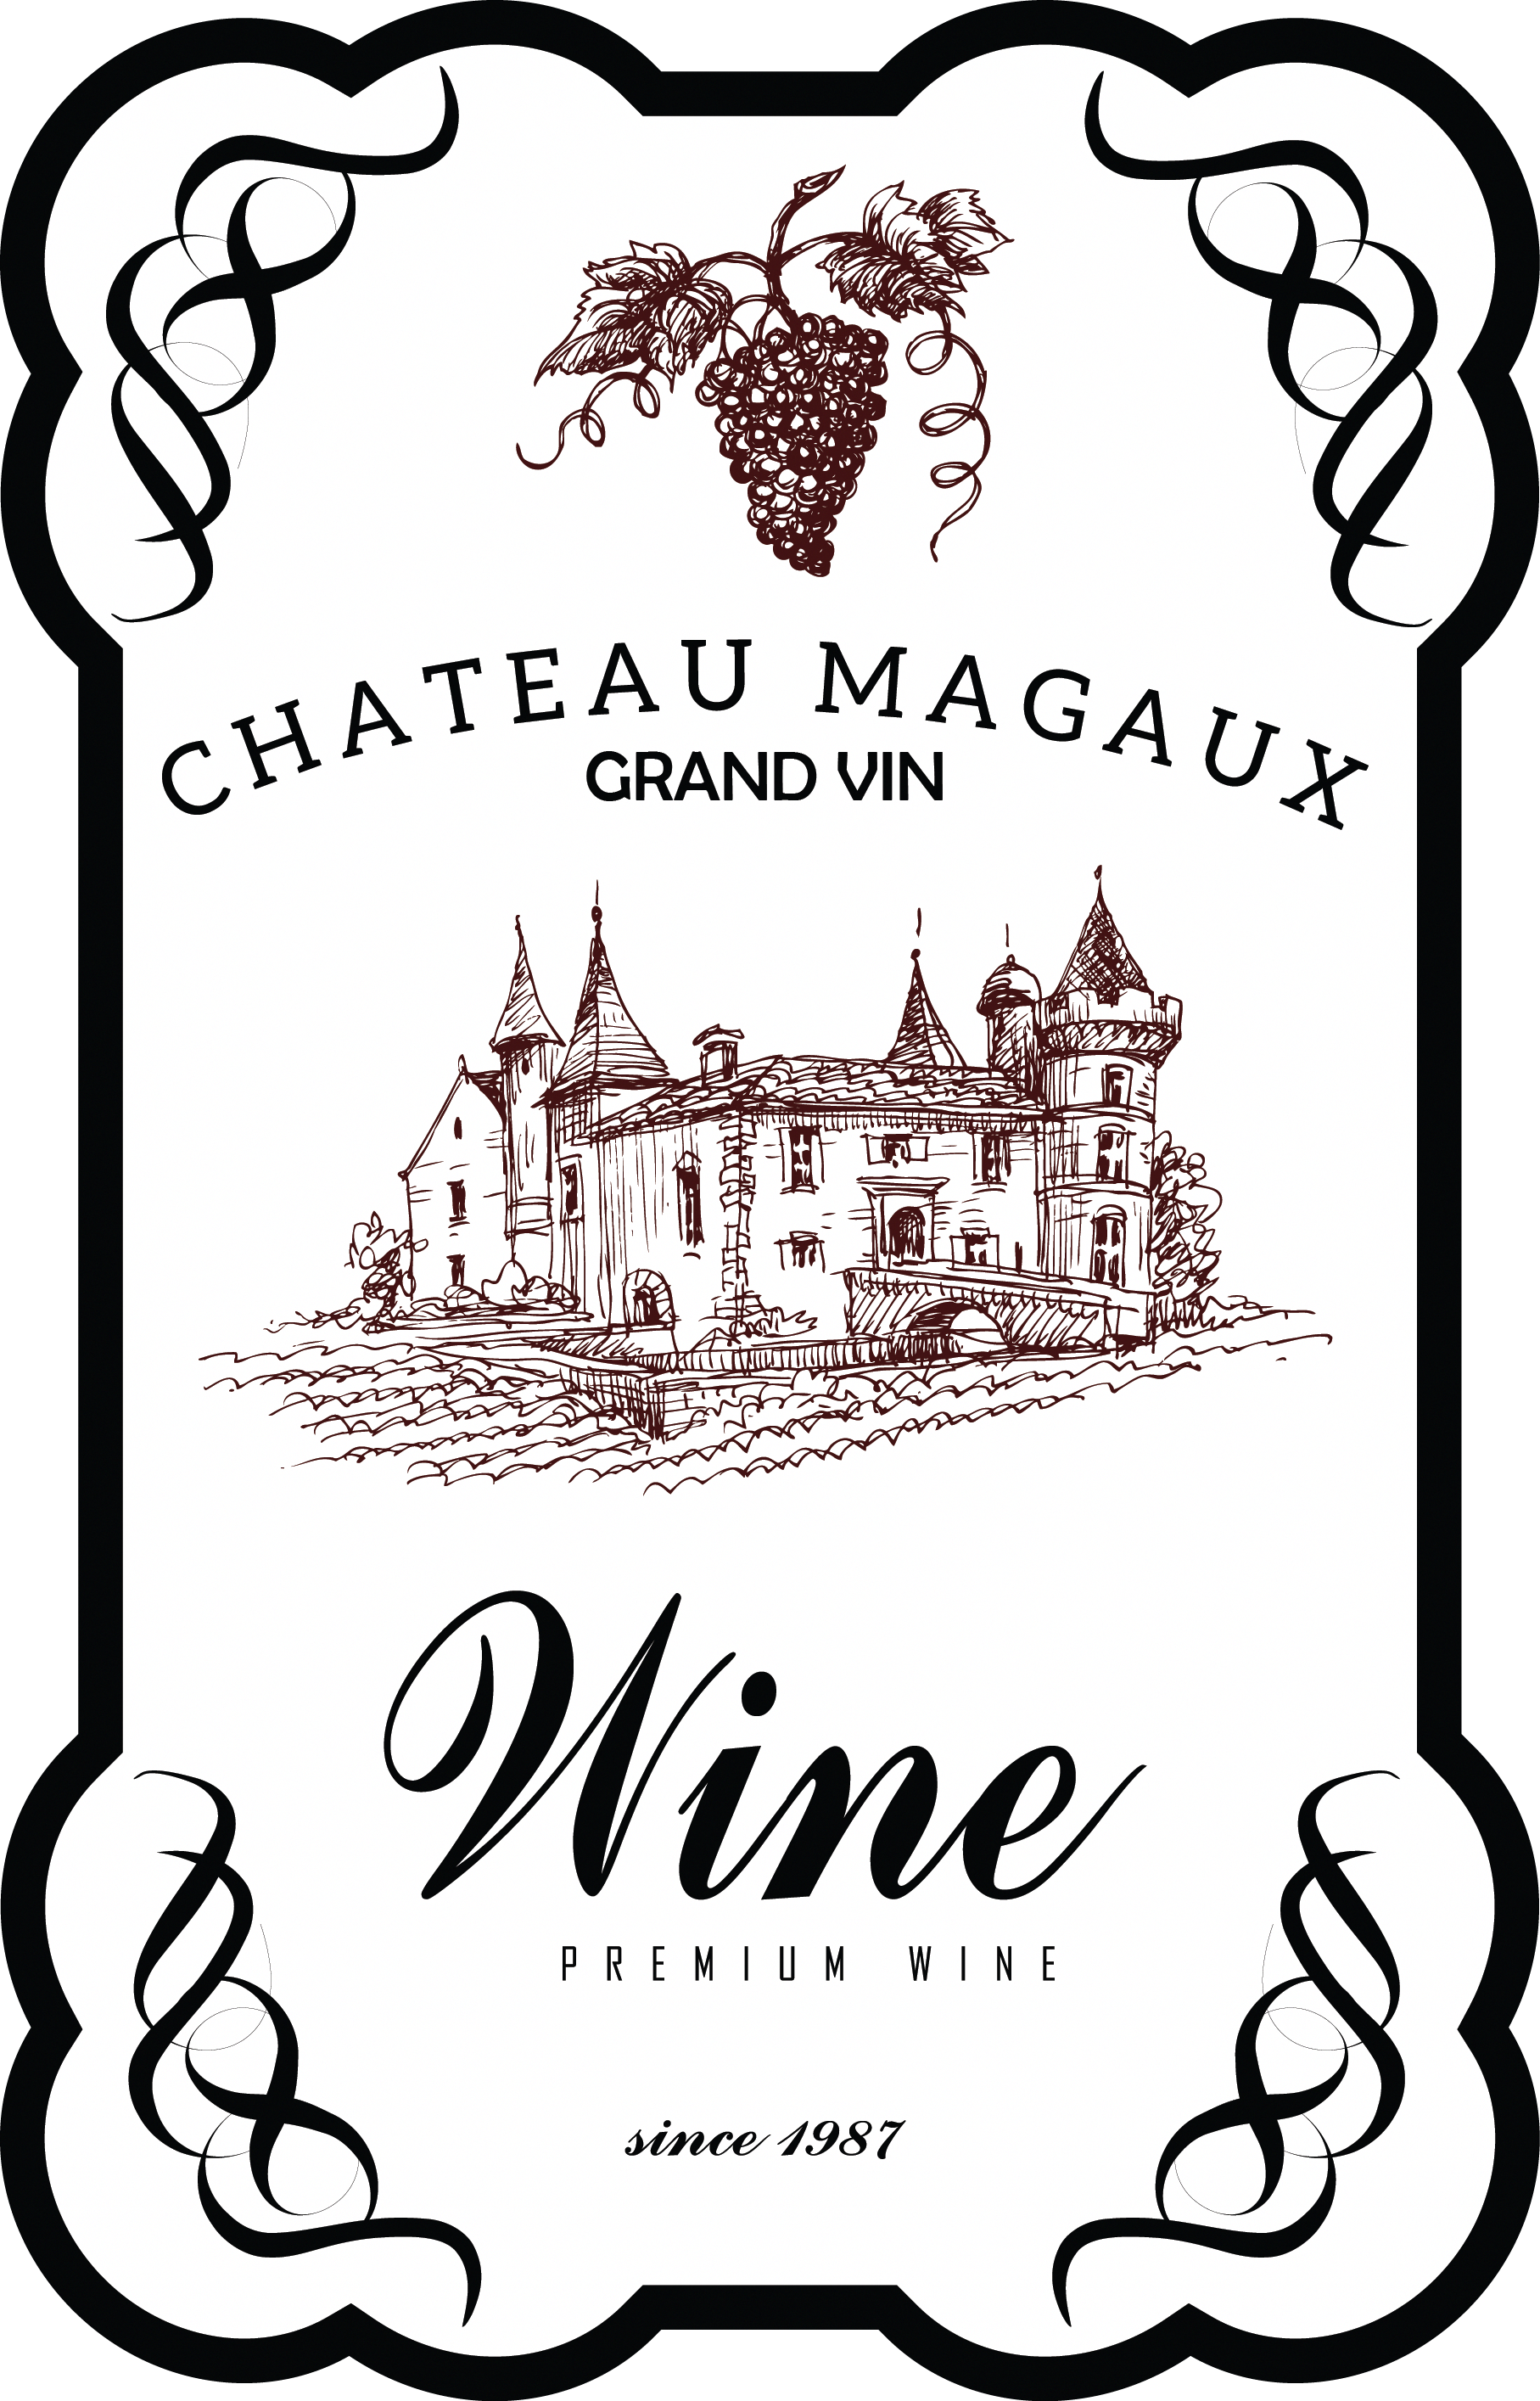 Inexpensive Wine Club Wineenthusiastgifts Product Id 6549852431 Personalisedwineglass Free Wine Label Template Vintage Wine Label Wine Label Template